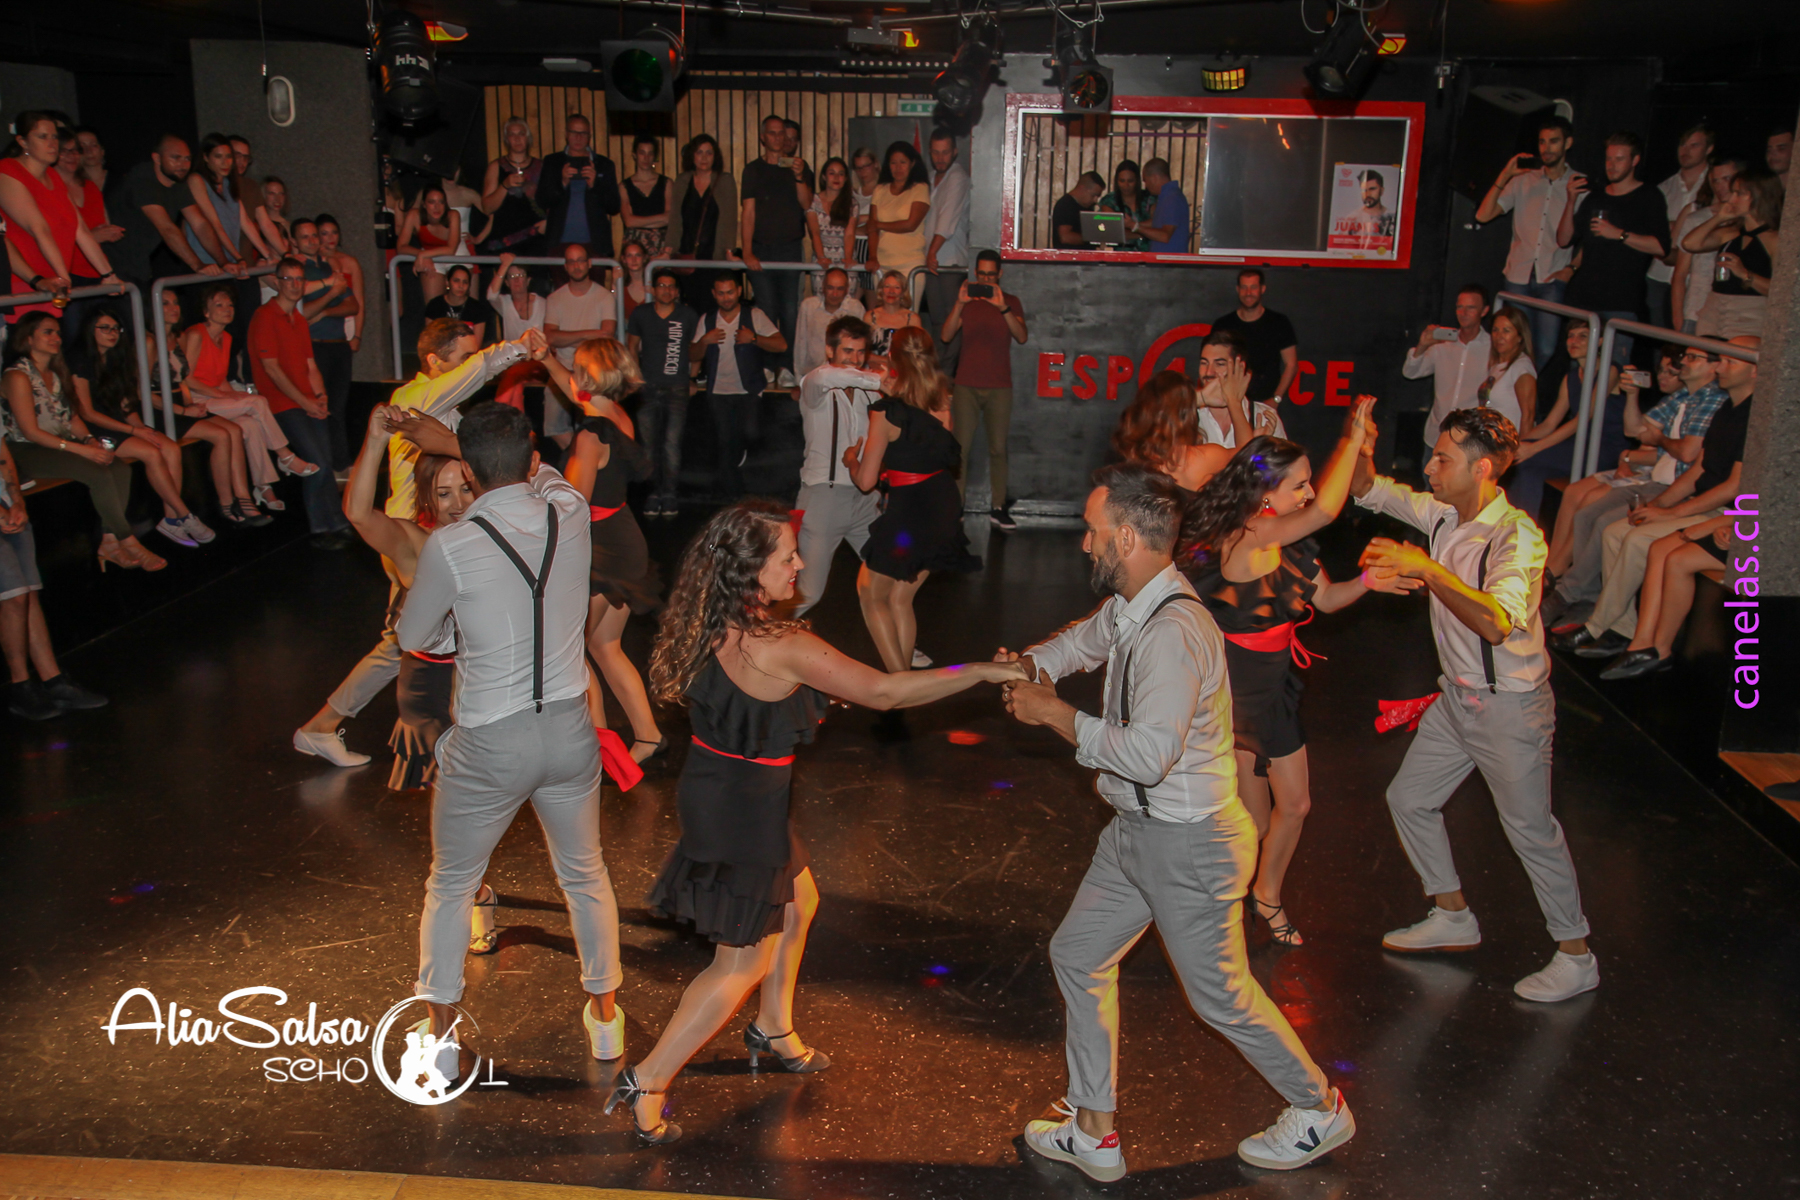 AliaSalsa ecole de danse lausanne soiree bachata salsa cubaineAlia Salsa Soireé Salsa - Bachata-19